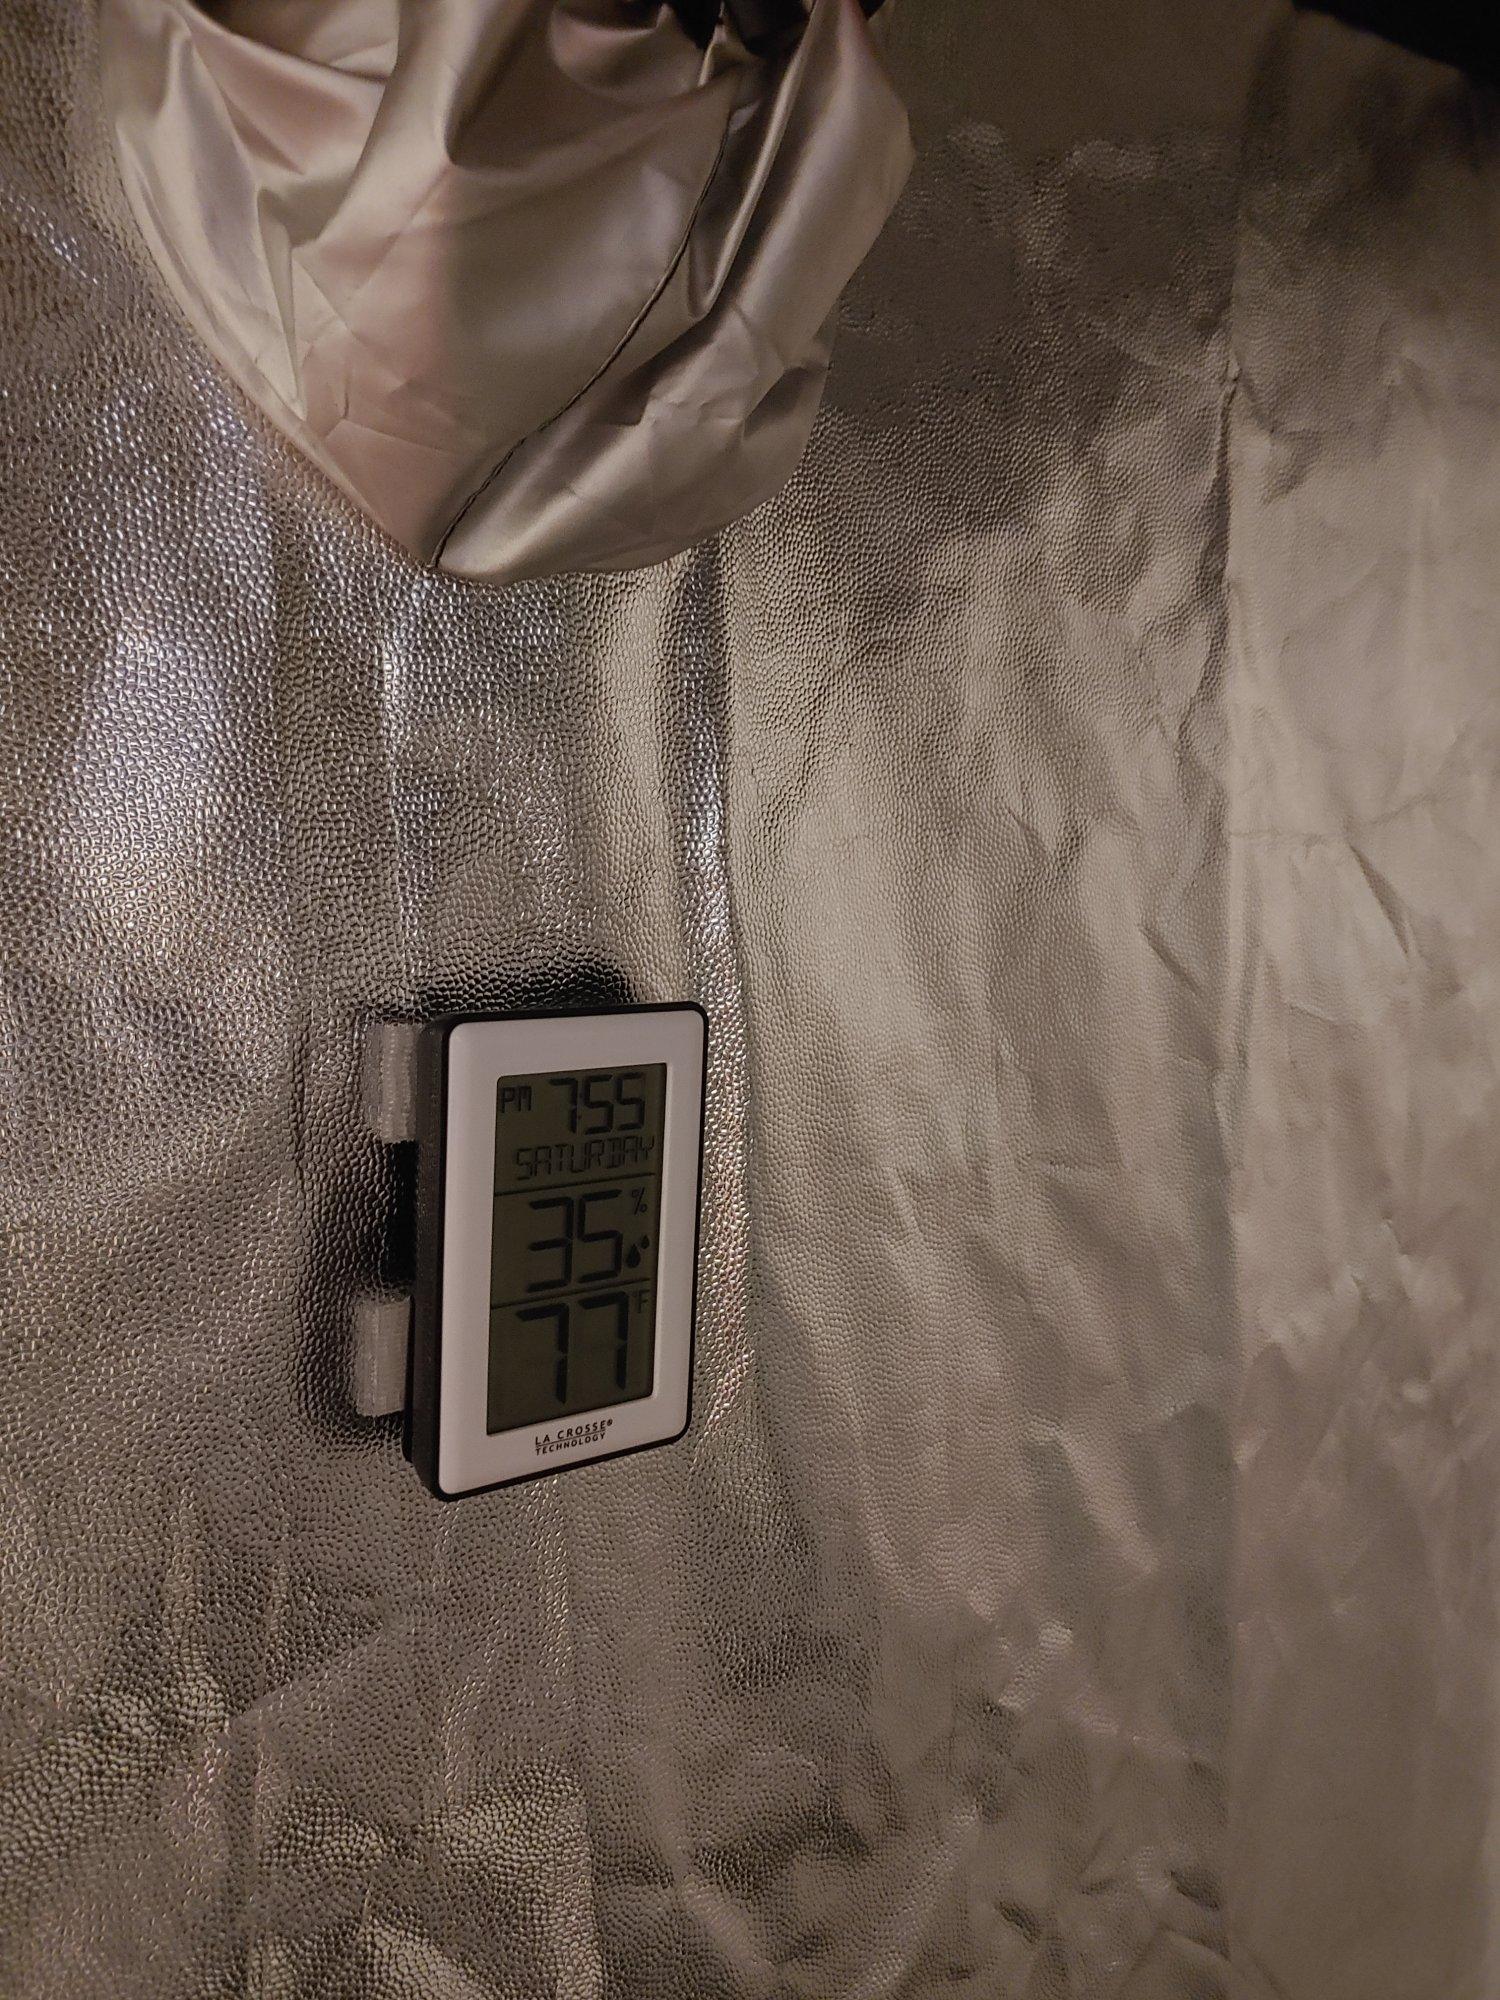 aTentThermometer.jpg